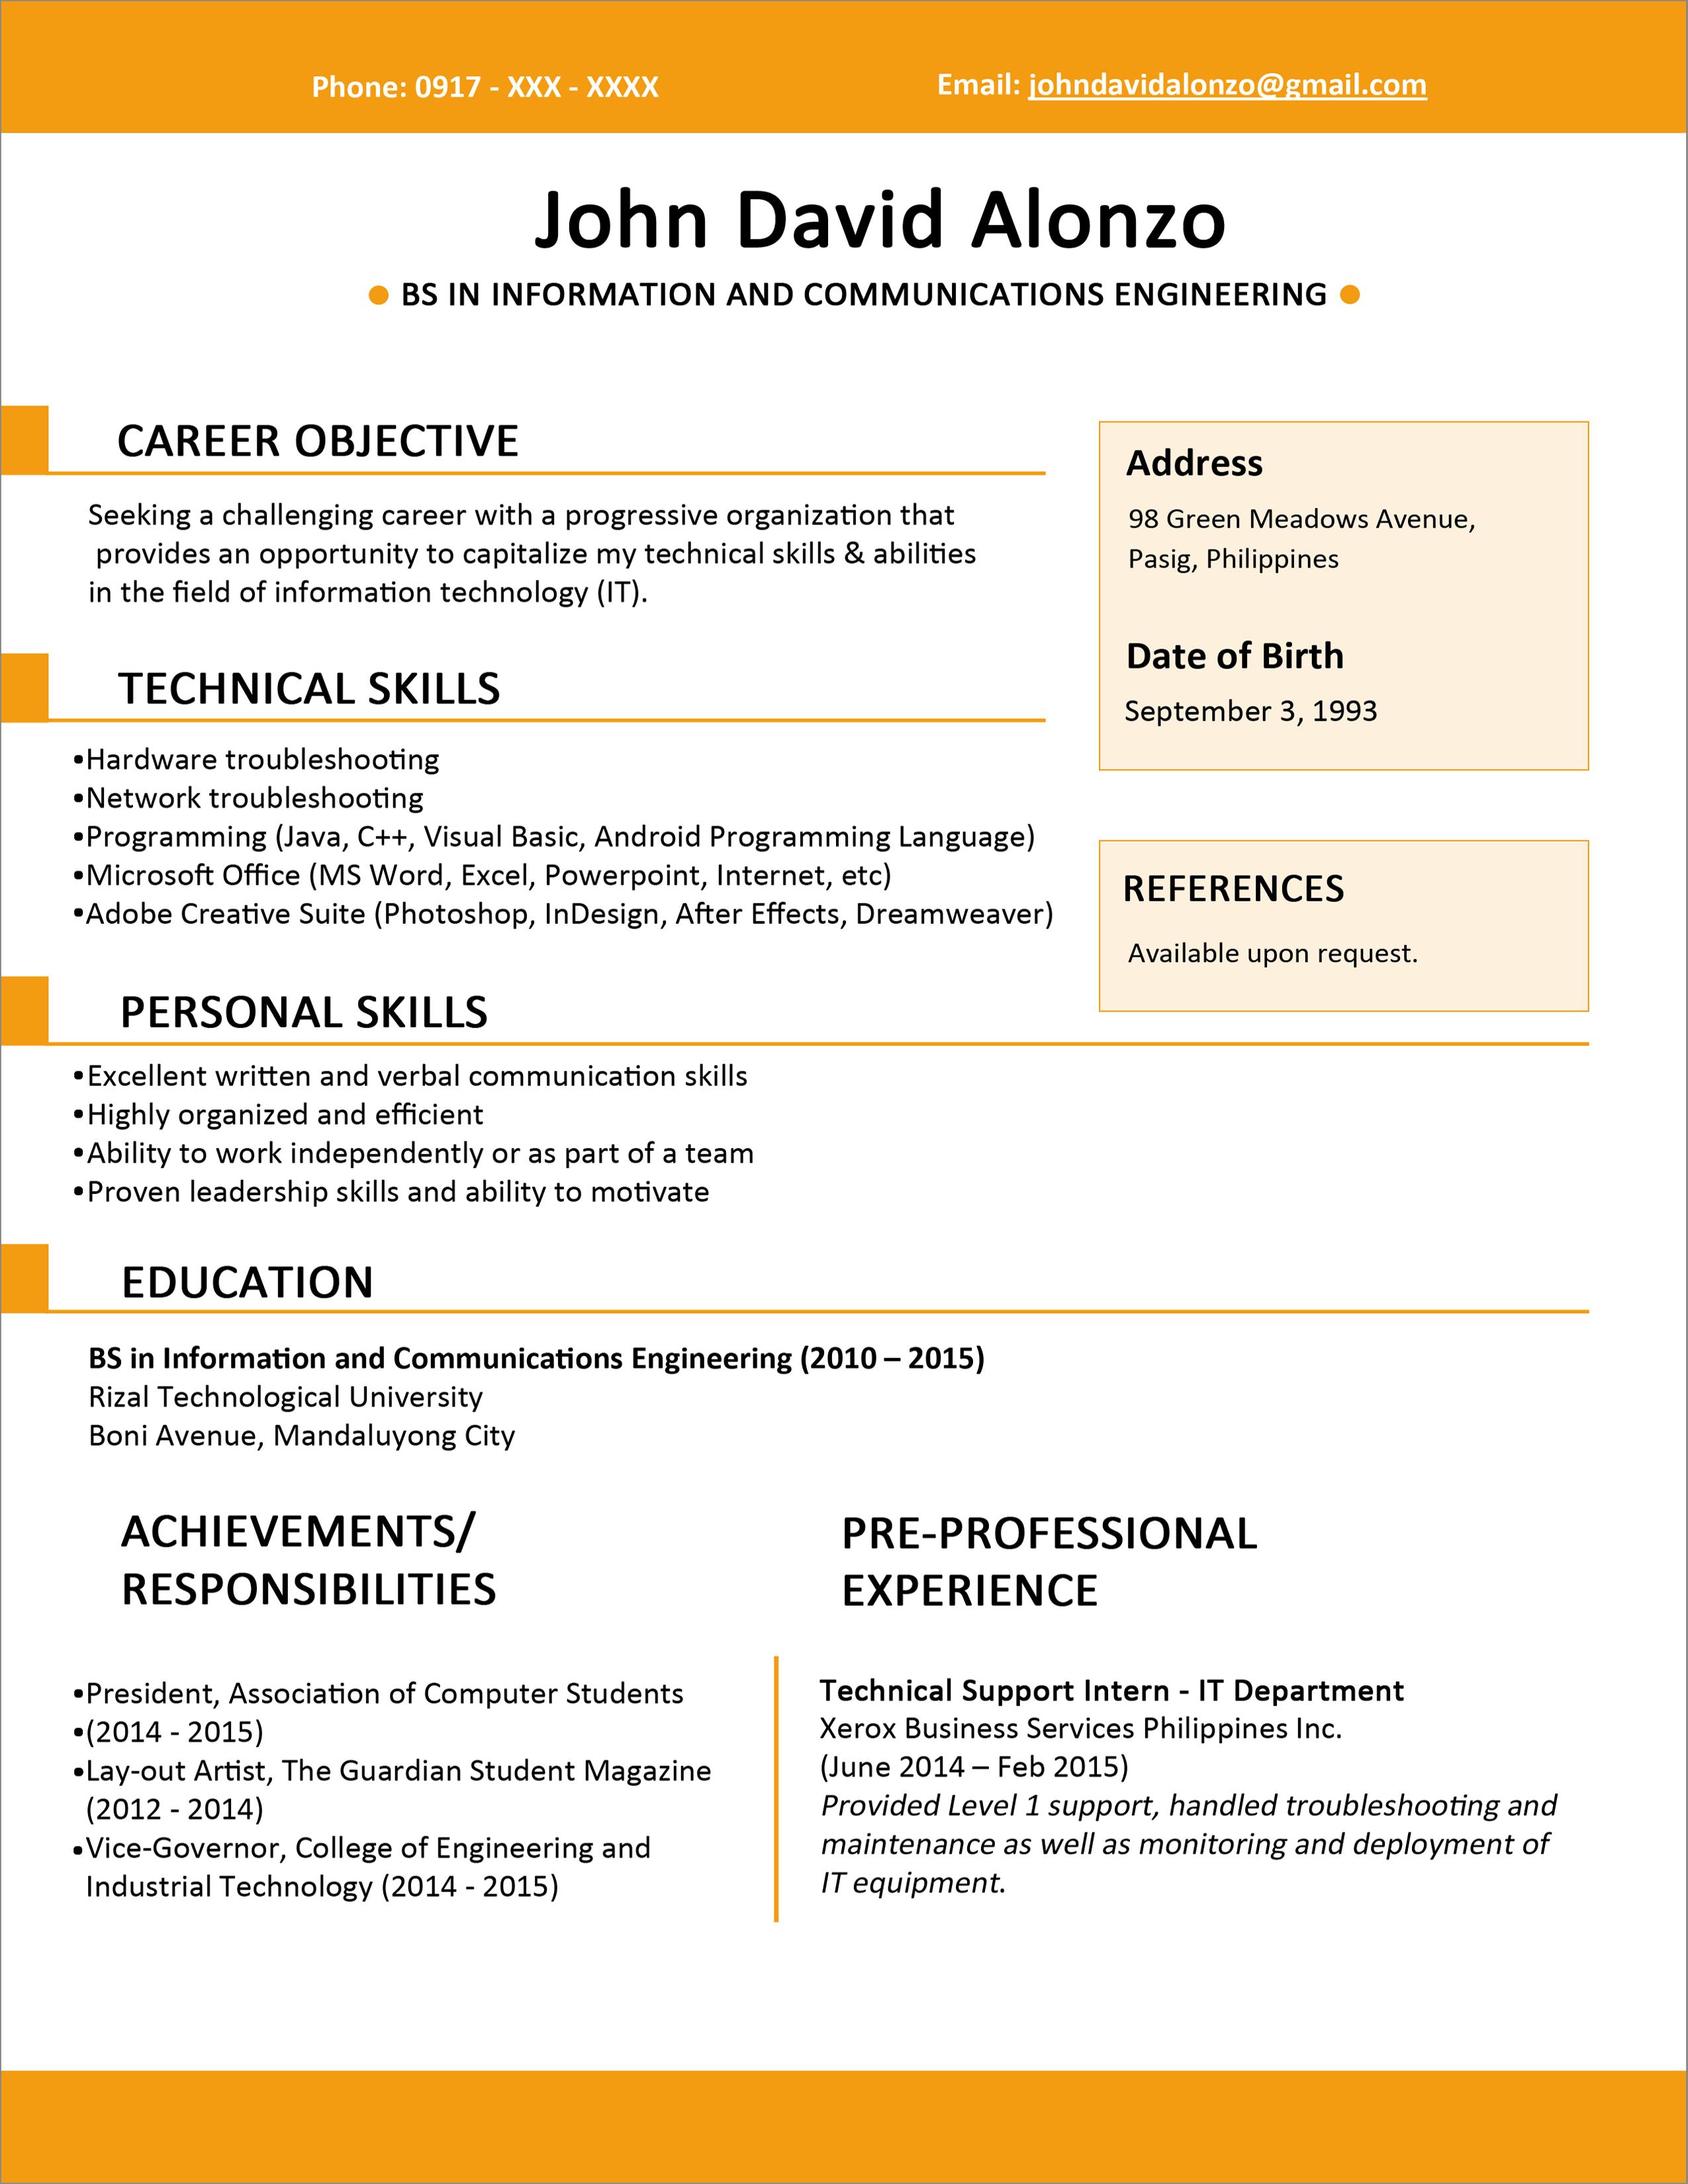 Sample Resume Format For Fresh Graduates One Page Format 4 Sample Resume Templates Job Resume Format Basic Resume